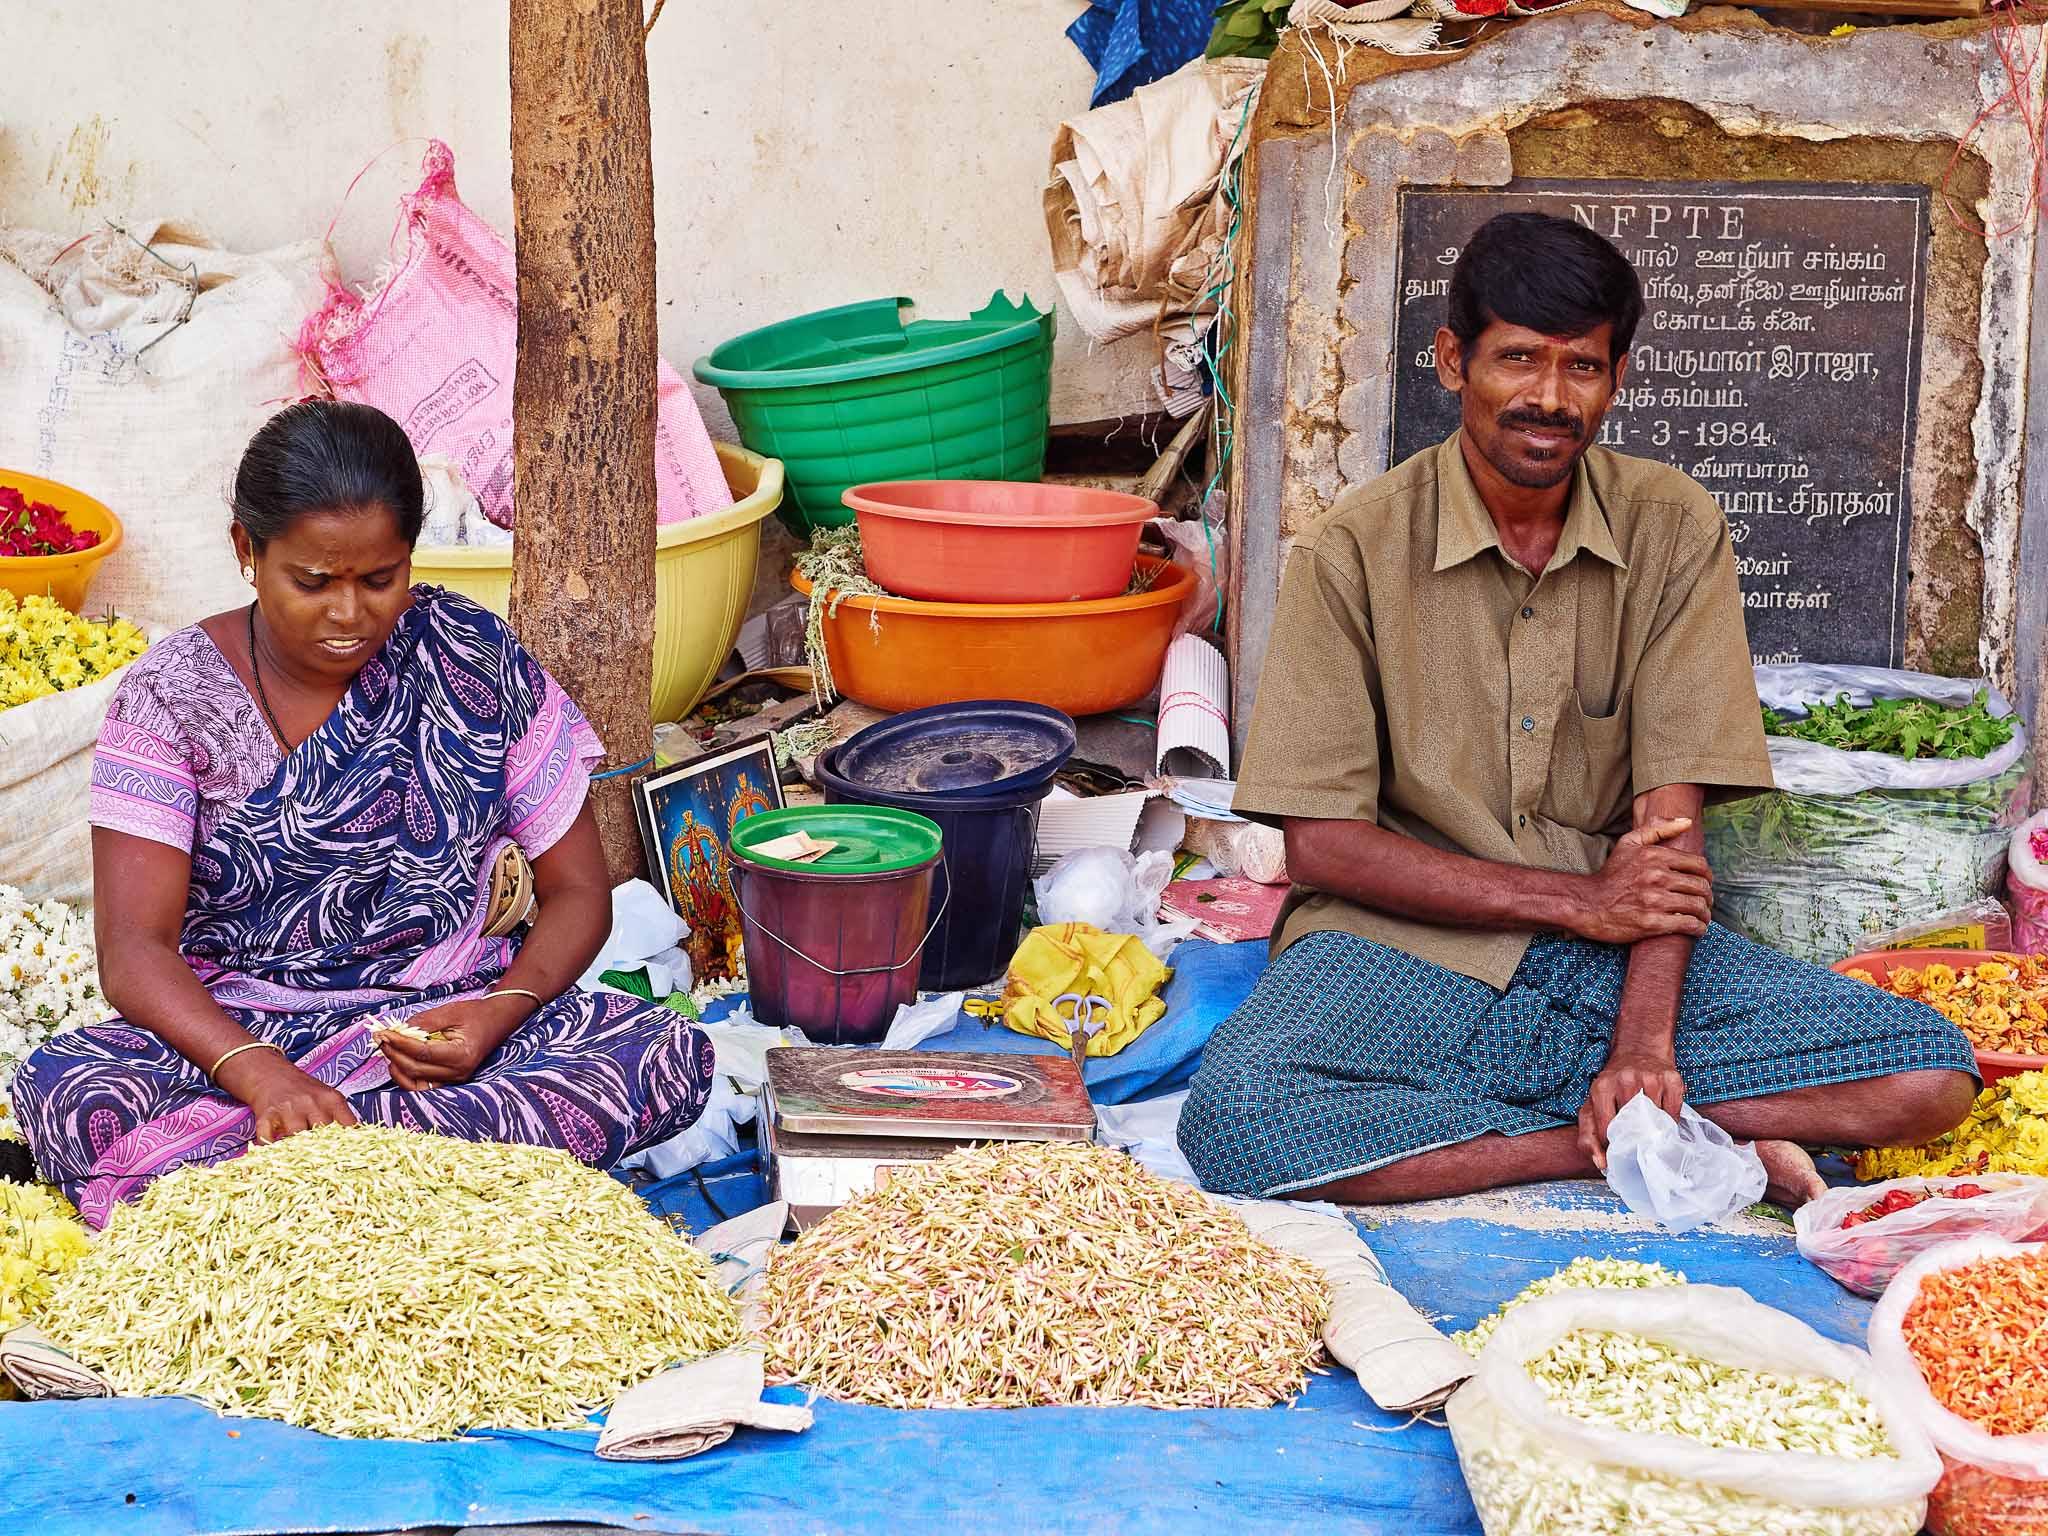 A florist couple at work in their roadside flower shop, Virudhunagar, Tamil Nadu, India